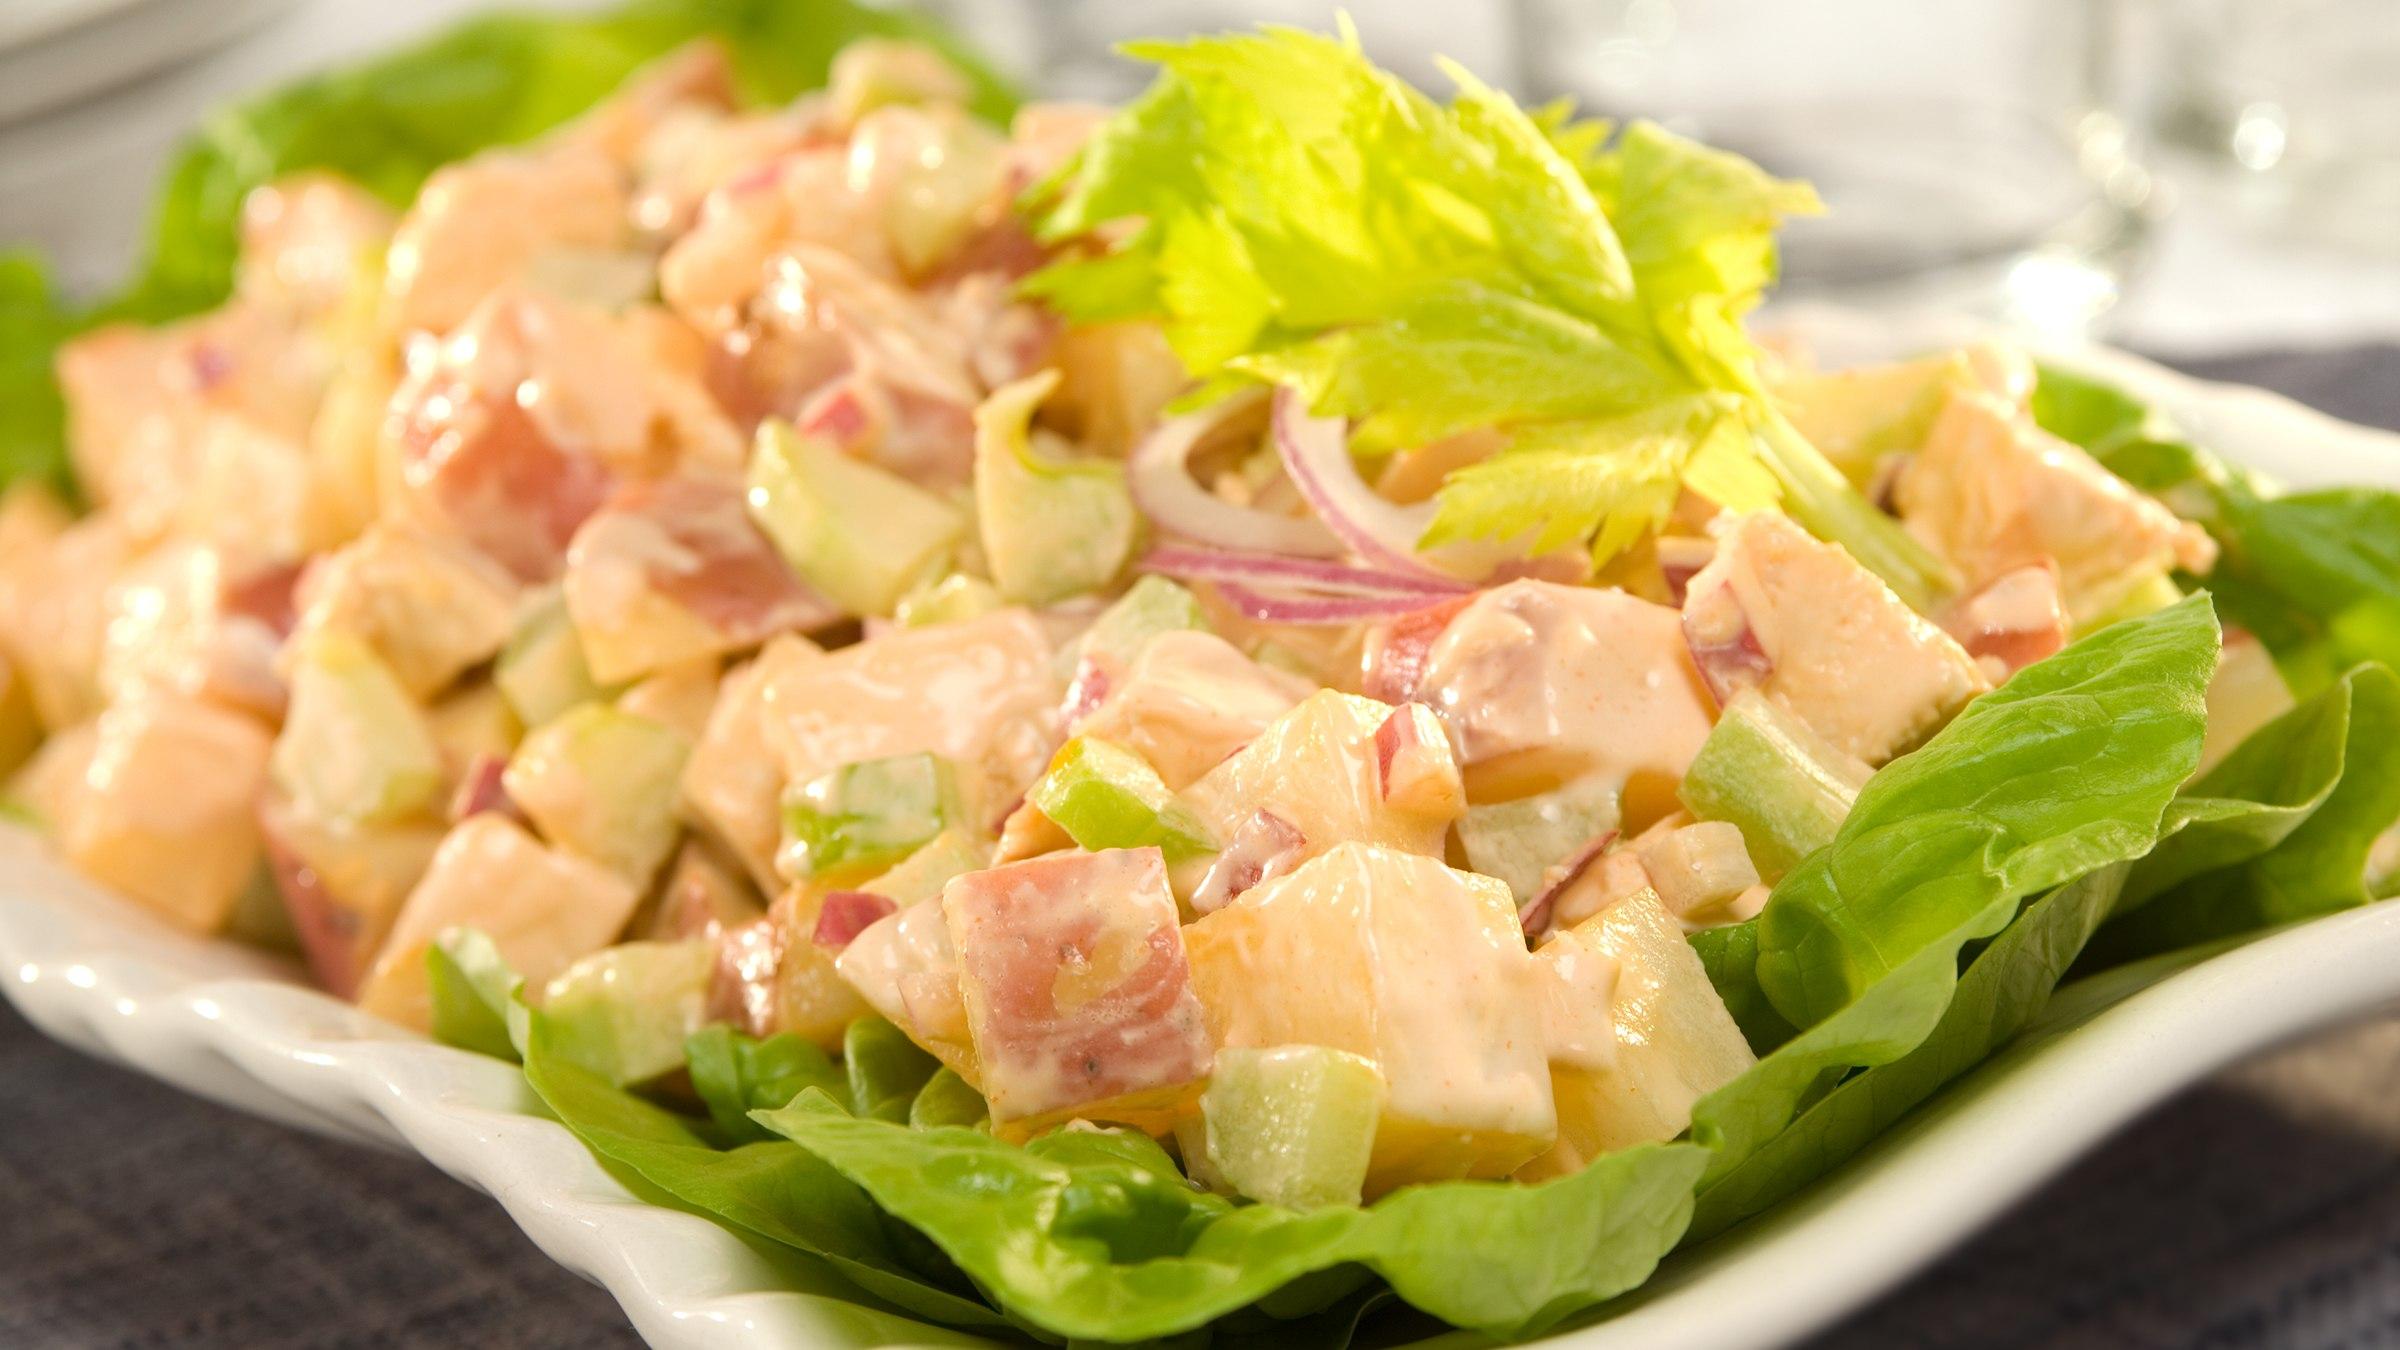 Buffalo Chicken & Potato Salad